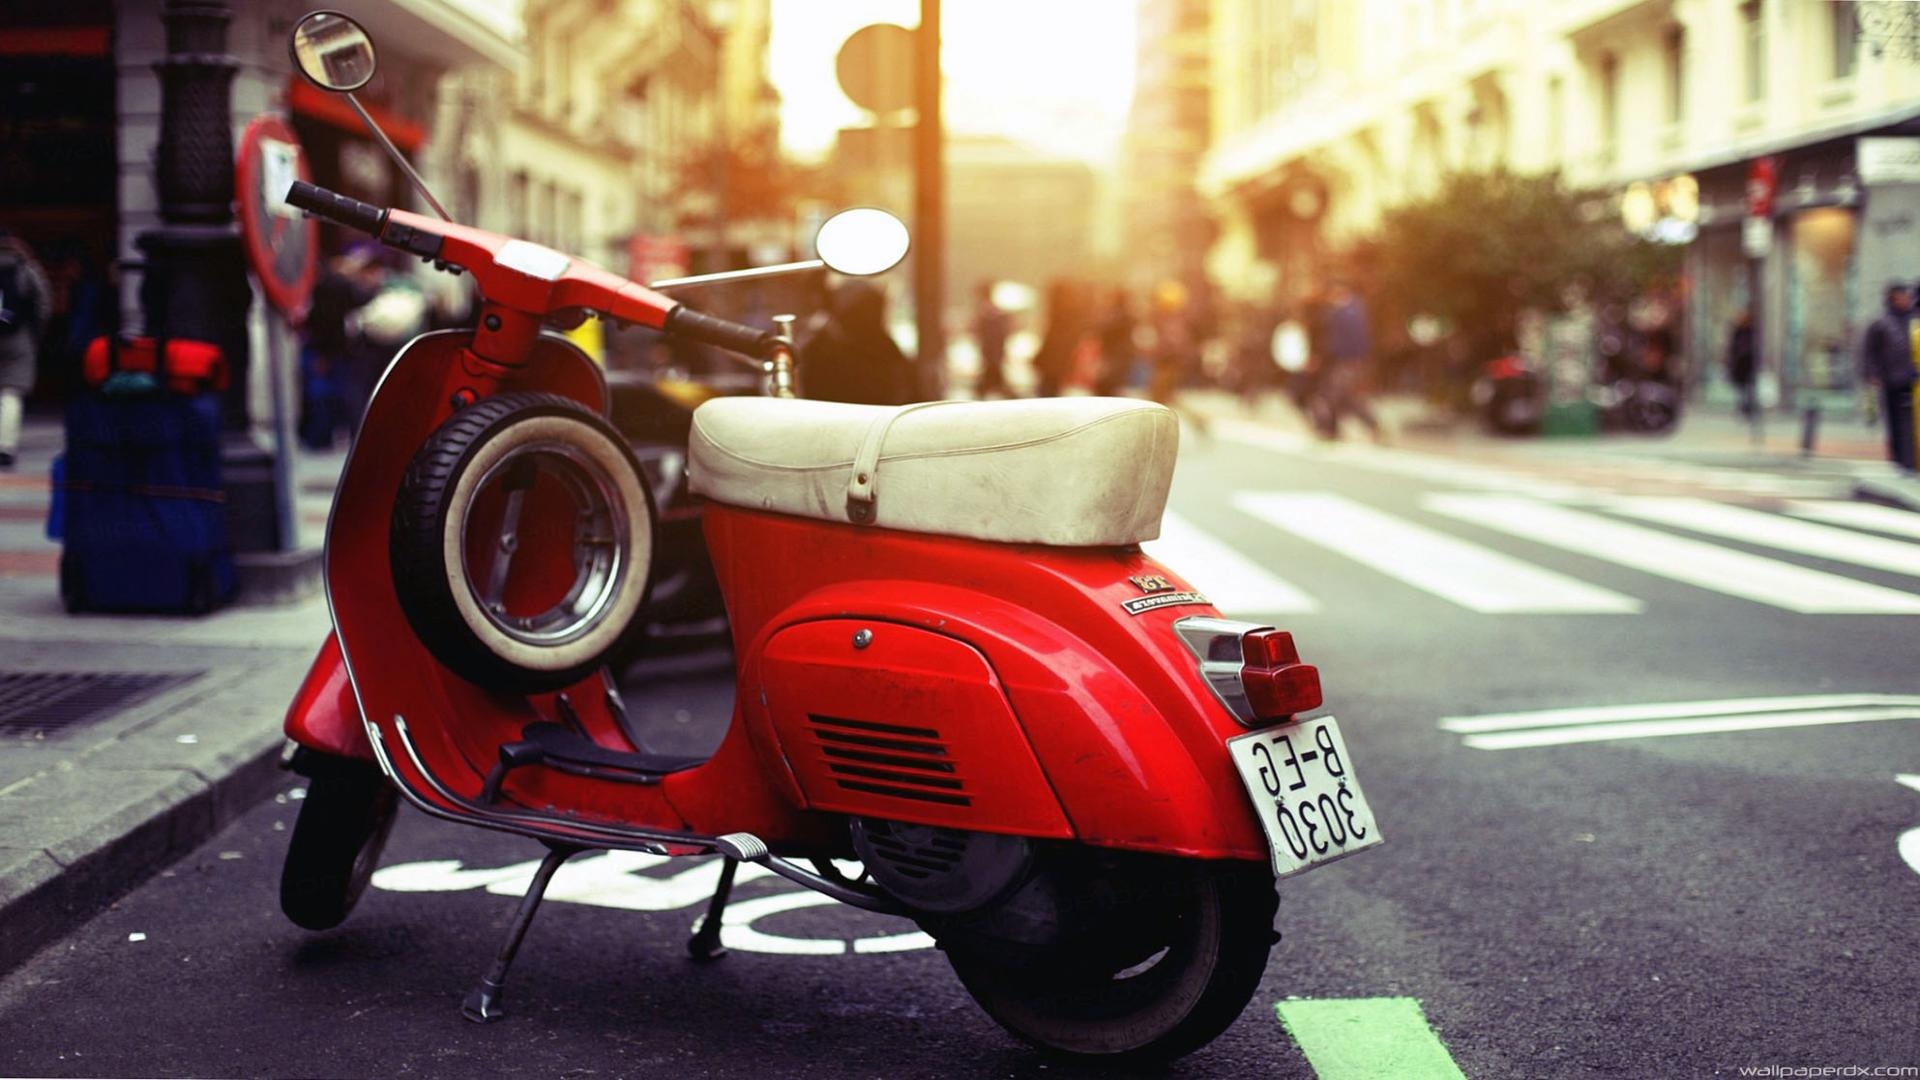 scooter vespa wide full hd wallpaper   1920 x 1080 1920x1080